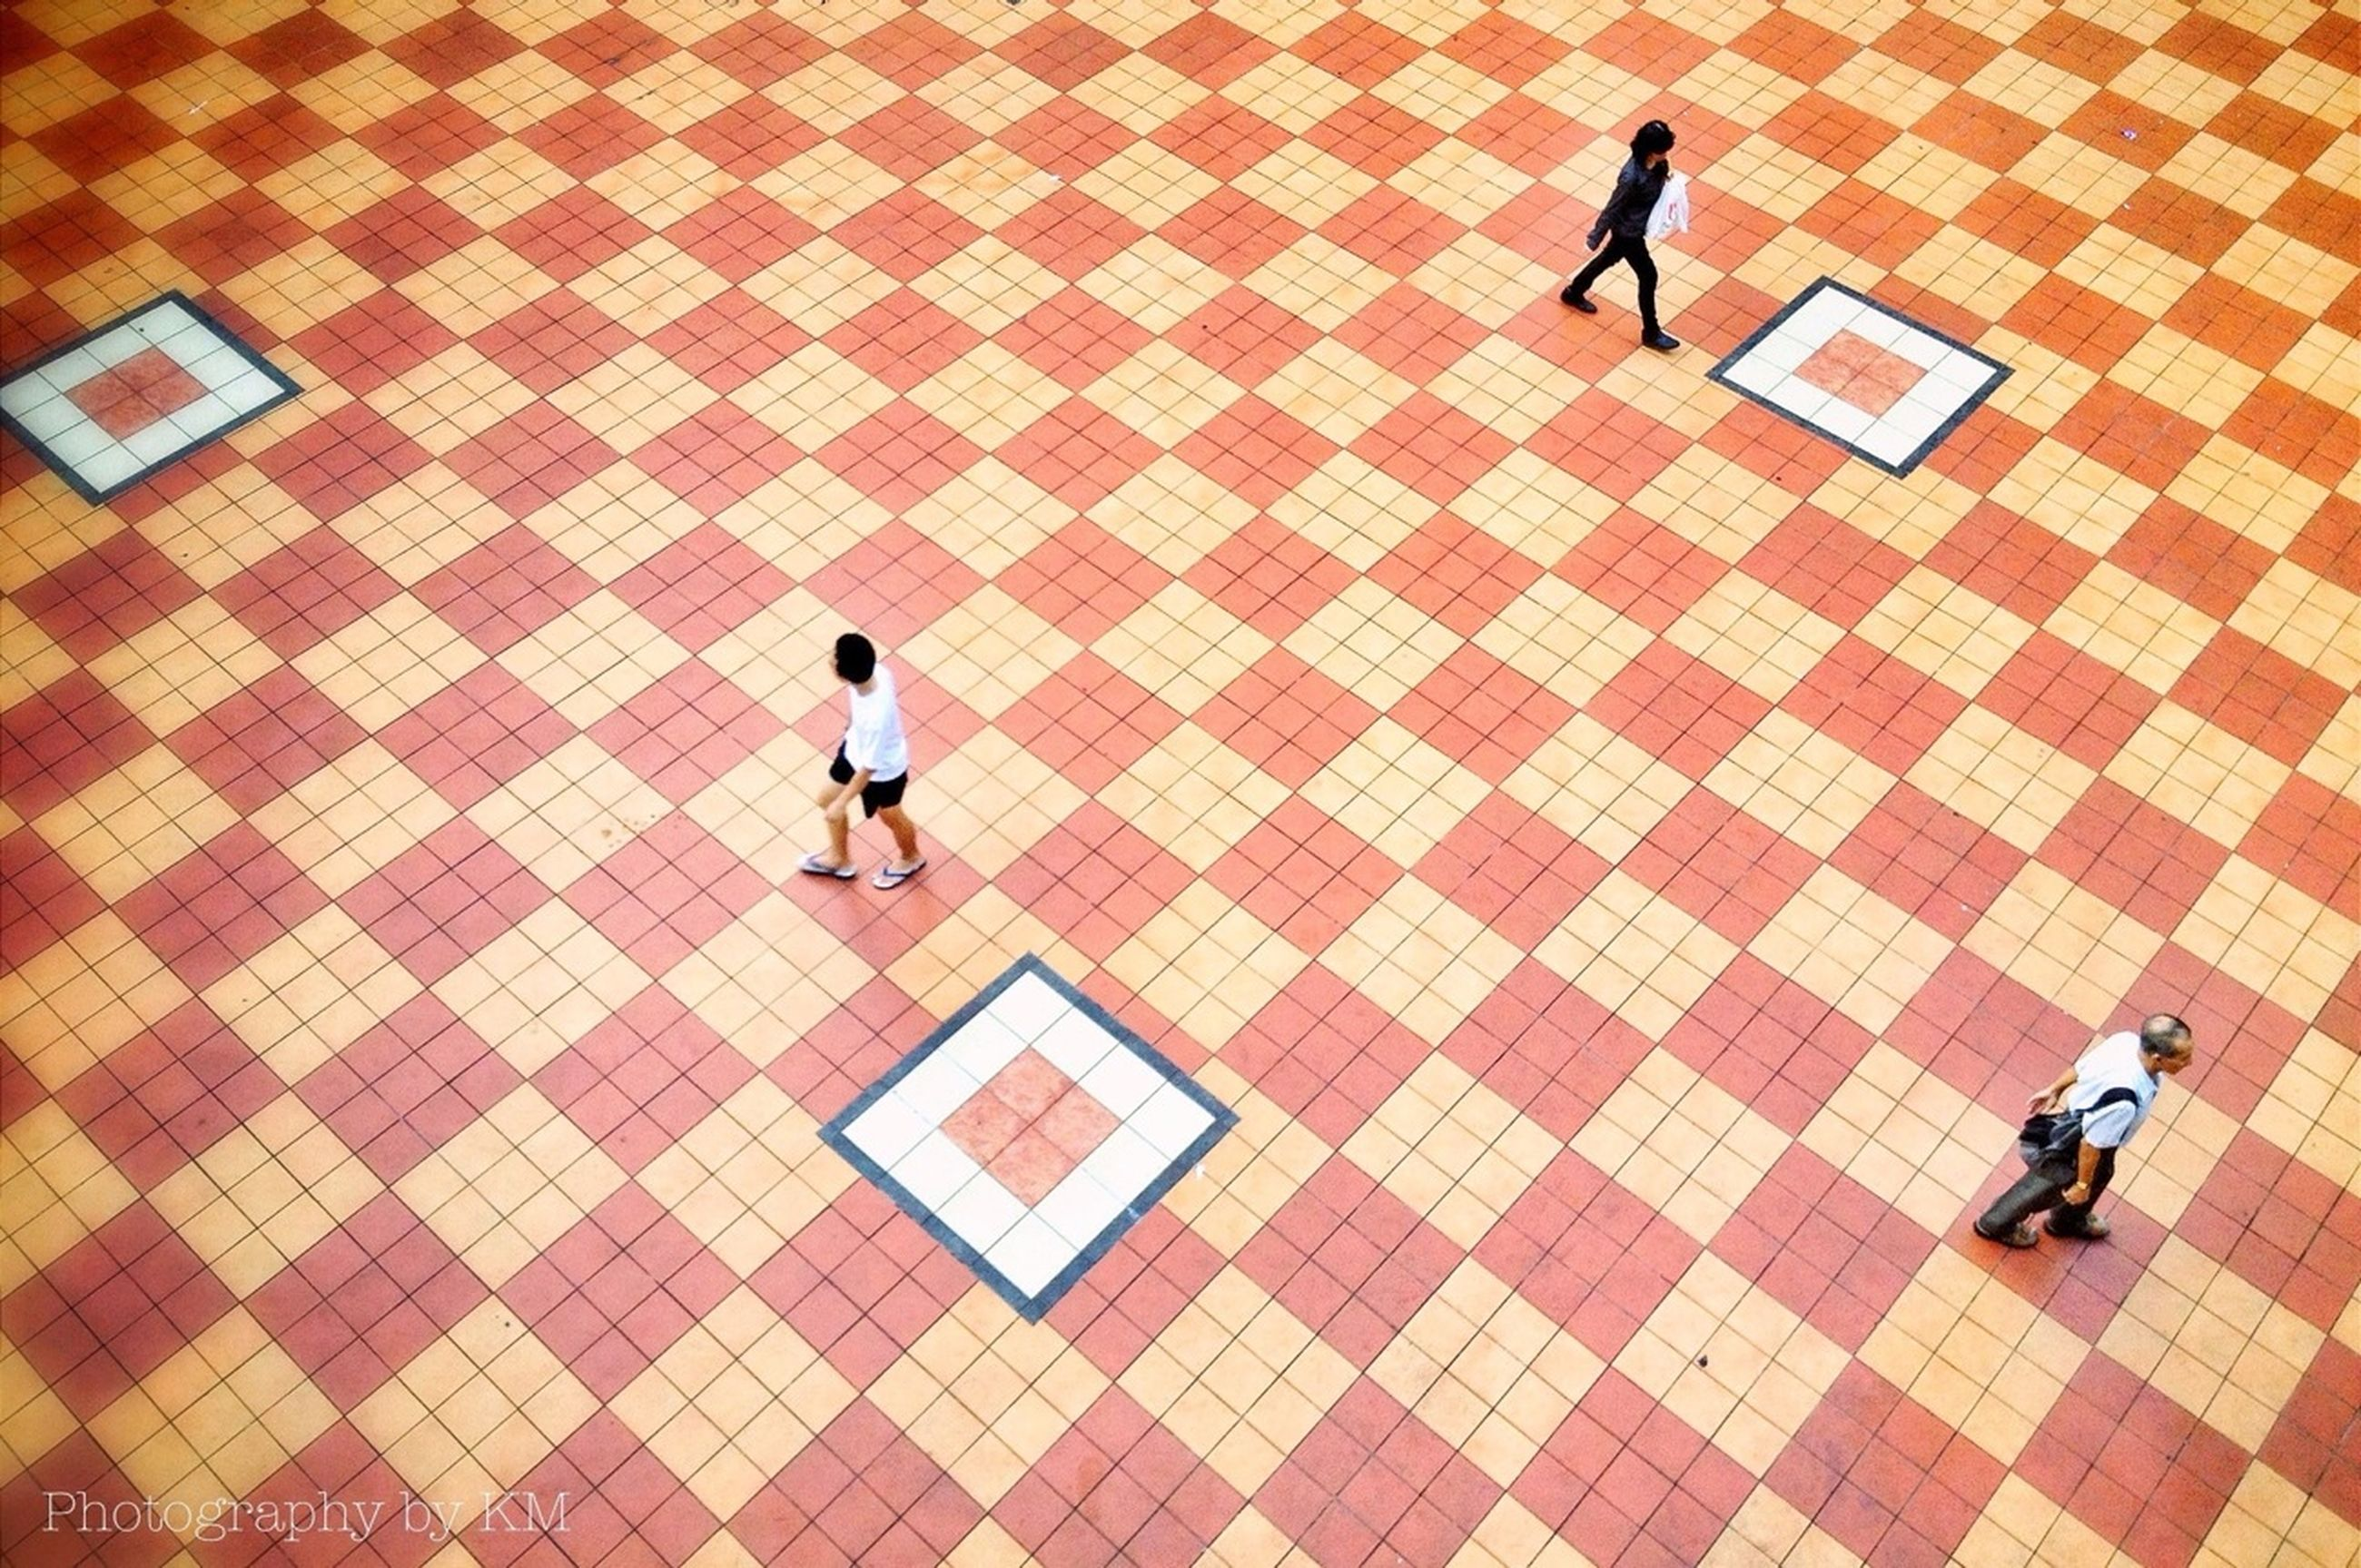 tiled floor, bird, walking, full length, high angle view, flooring, cobblestone, shadow, men, tile, lifestyles, pavement, animal themes, paving stone, pattern, indoors, leisure activity, footpath